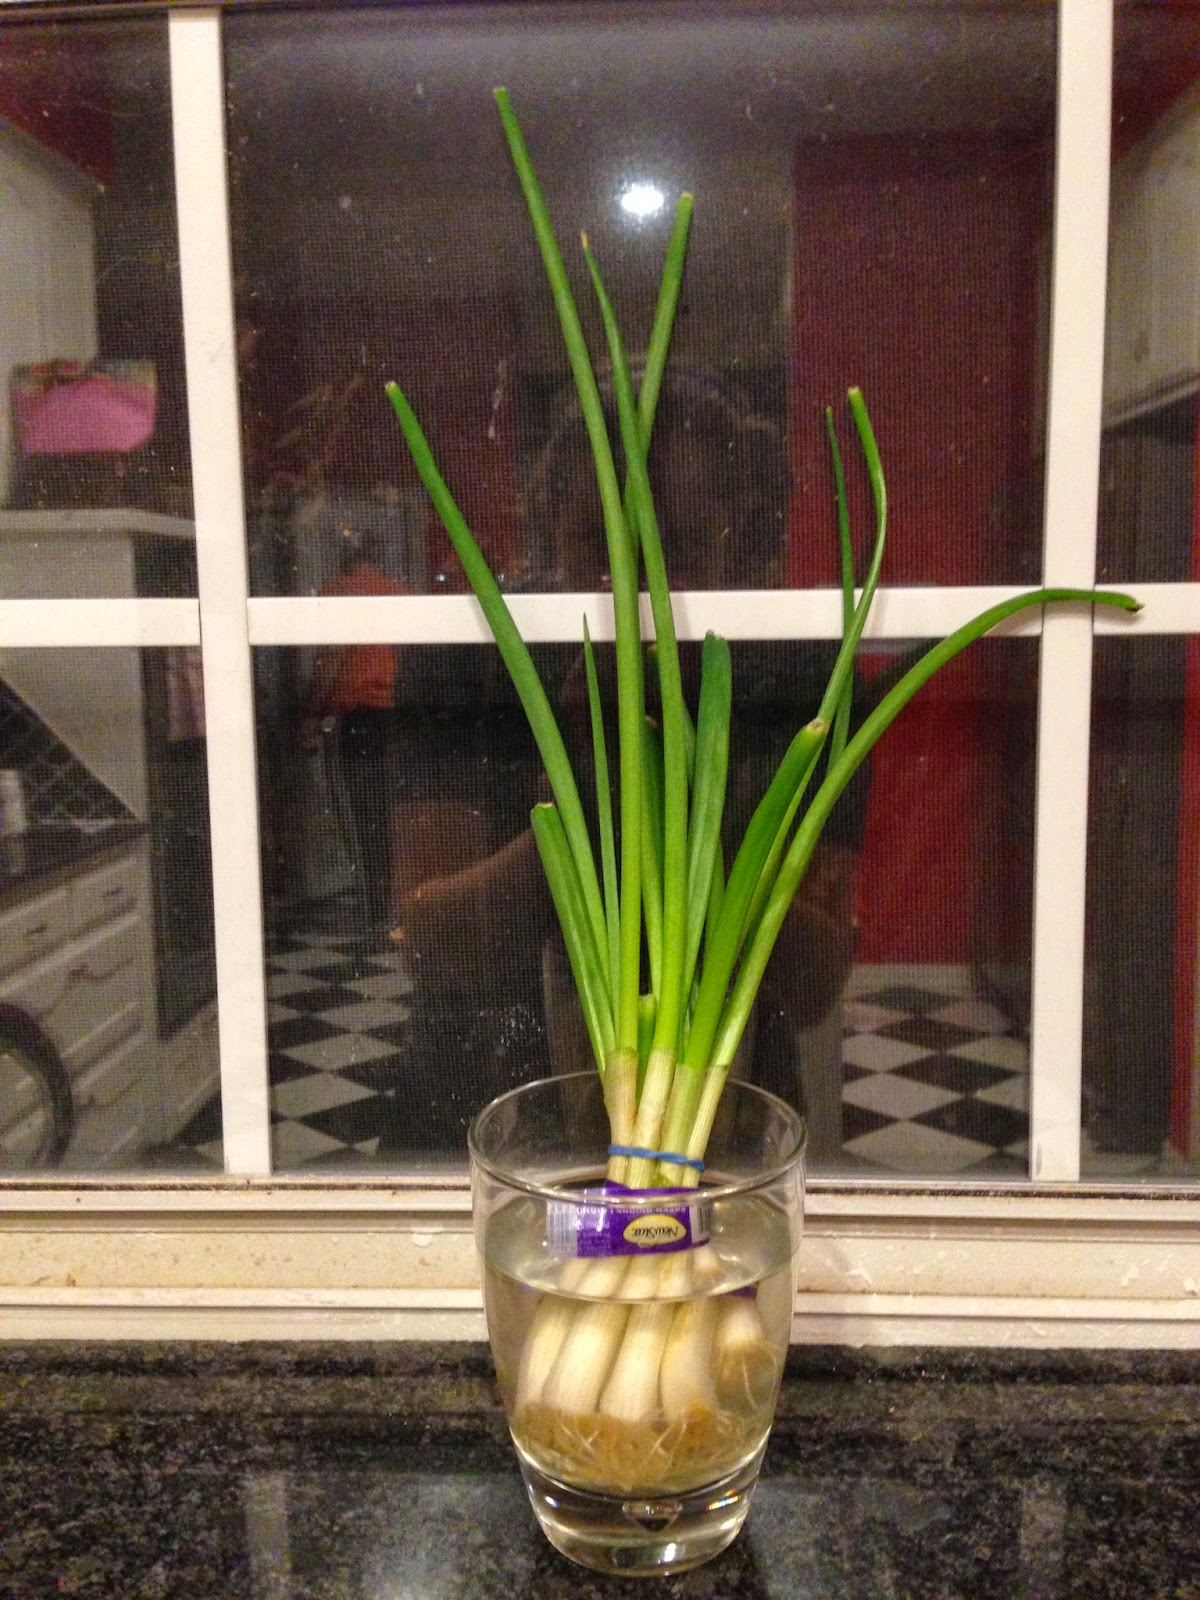 regrow green onions